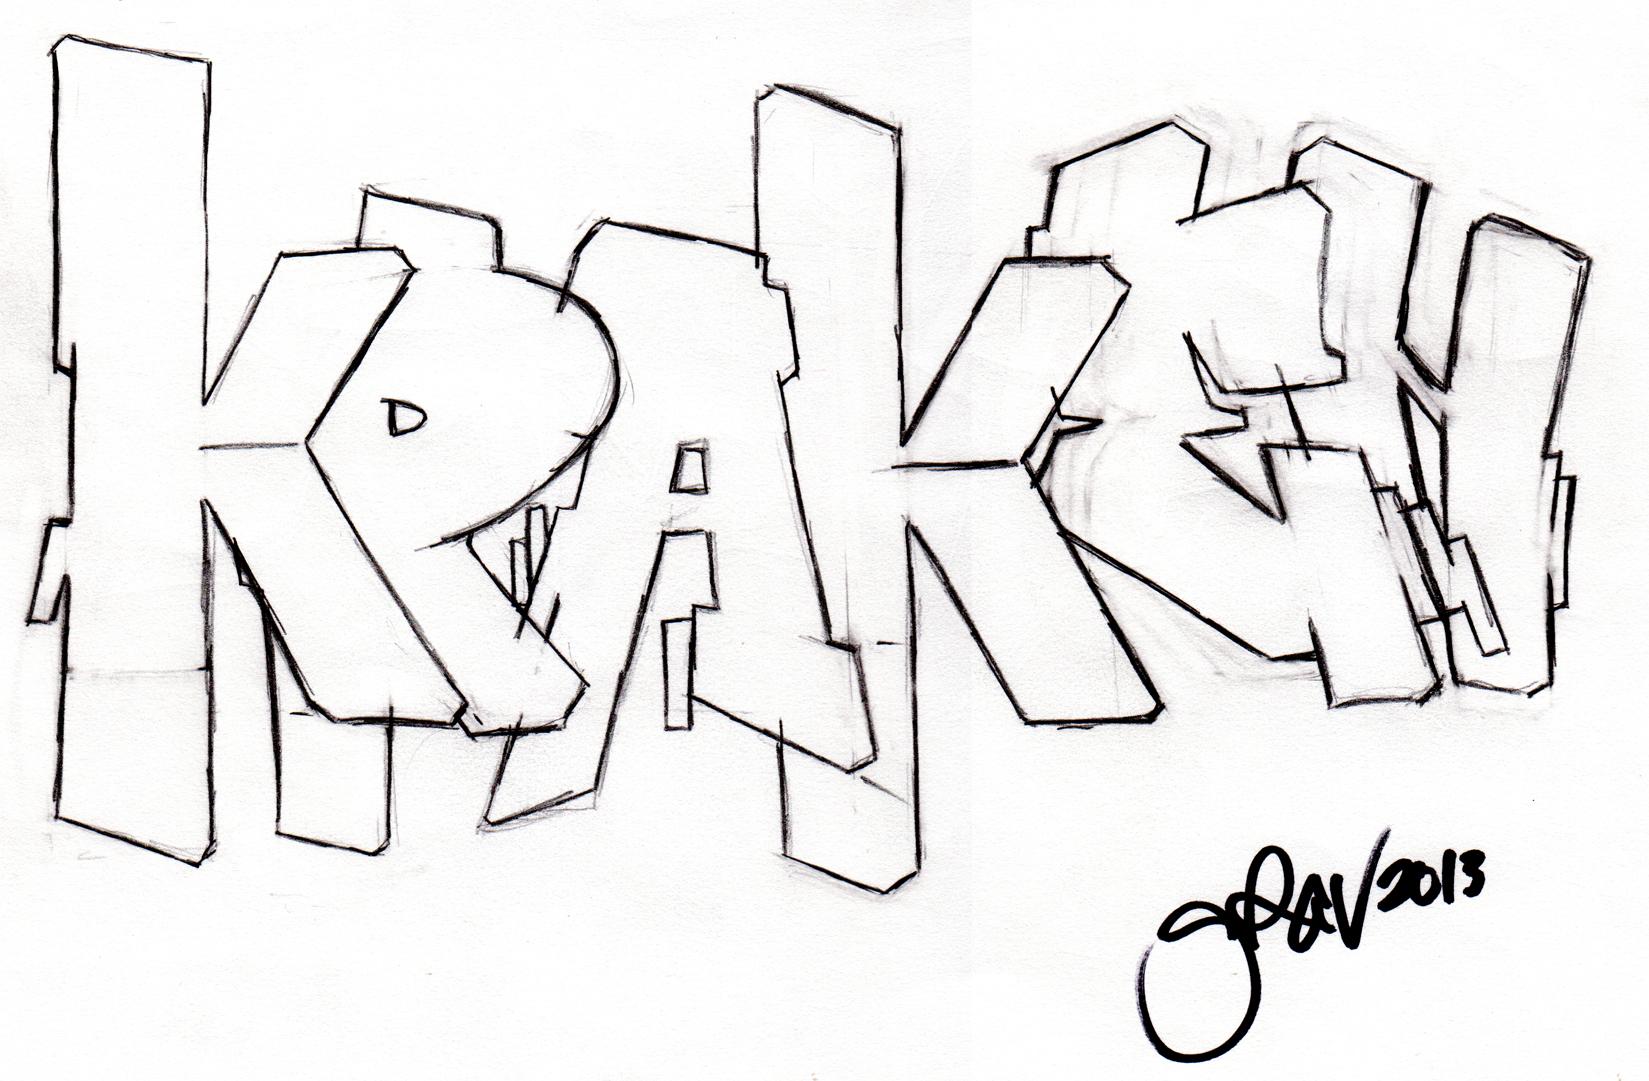 Graffiti Styles